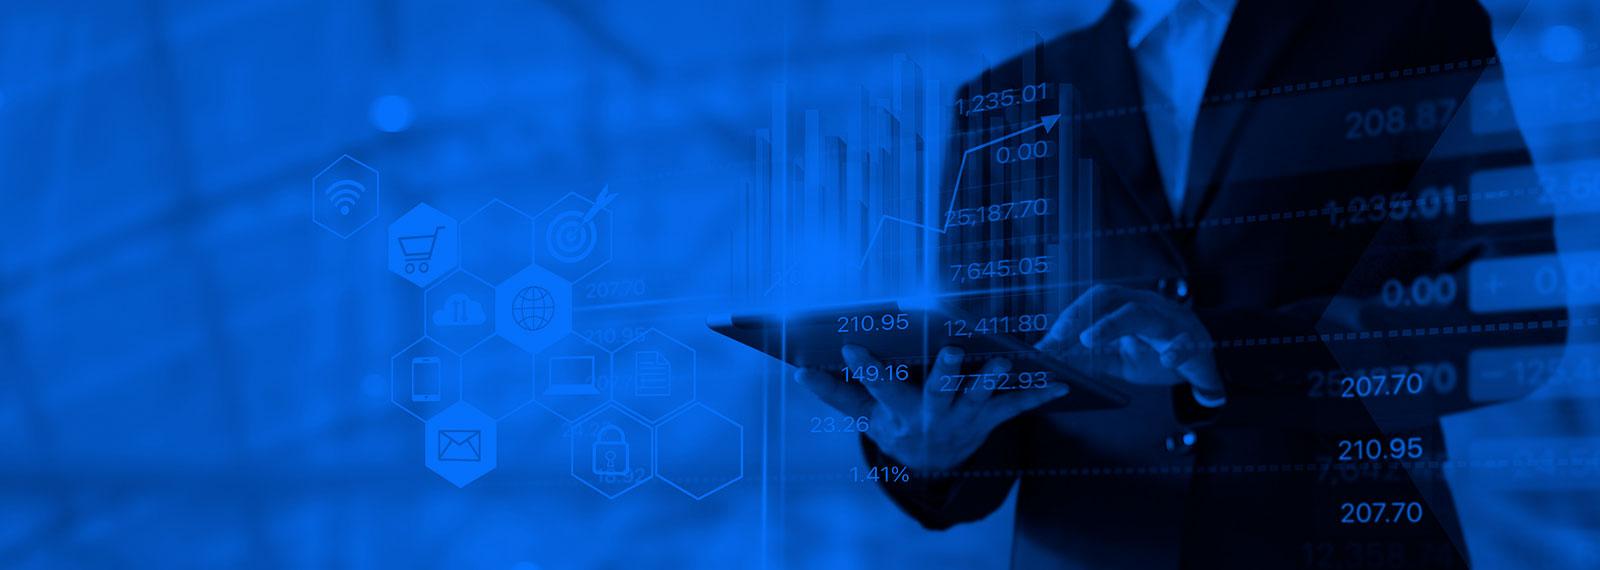 High-end digital and social media marketing